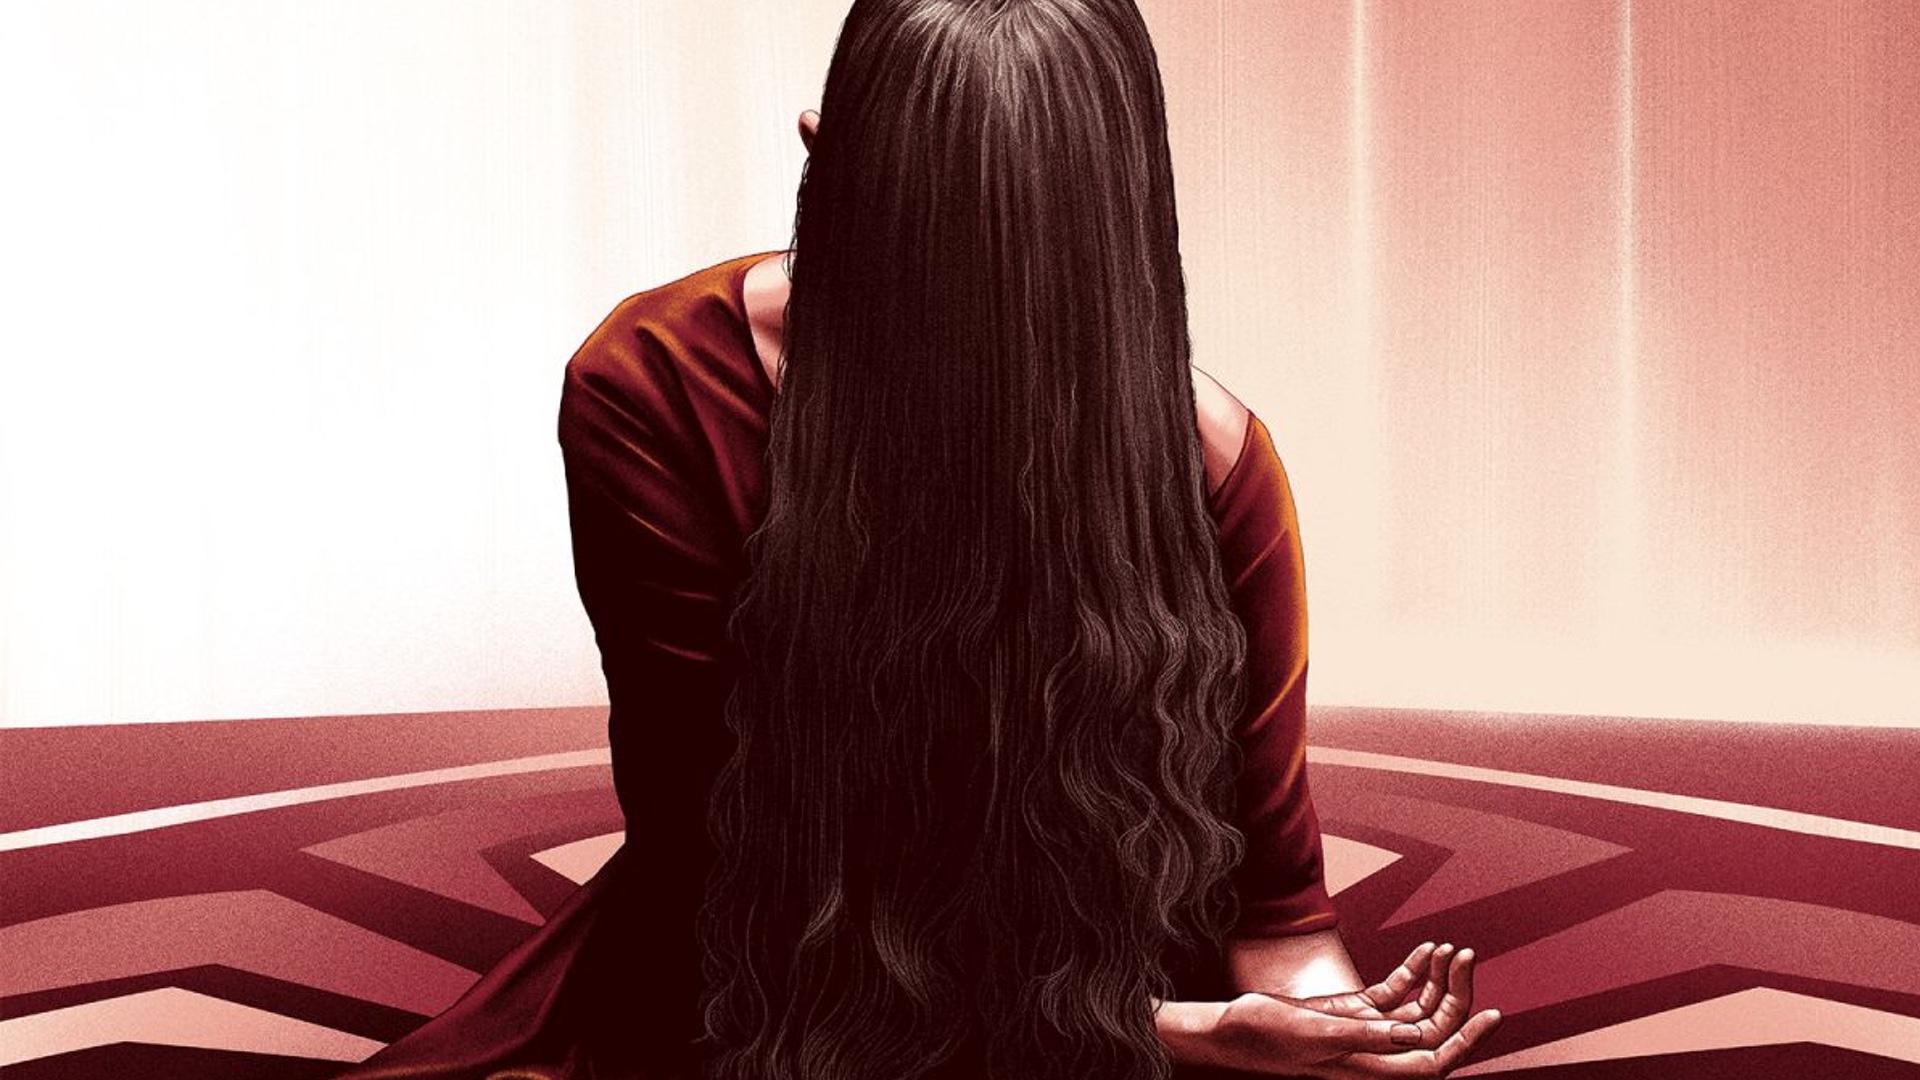 eerie-mondo-poster-art-for-upcoming-horror-film-suspiria-social.jpg